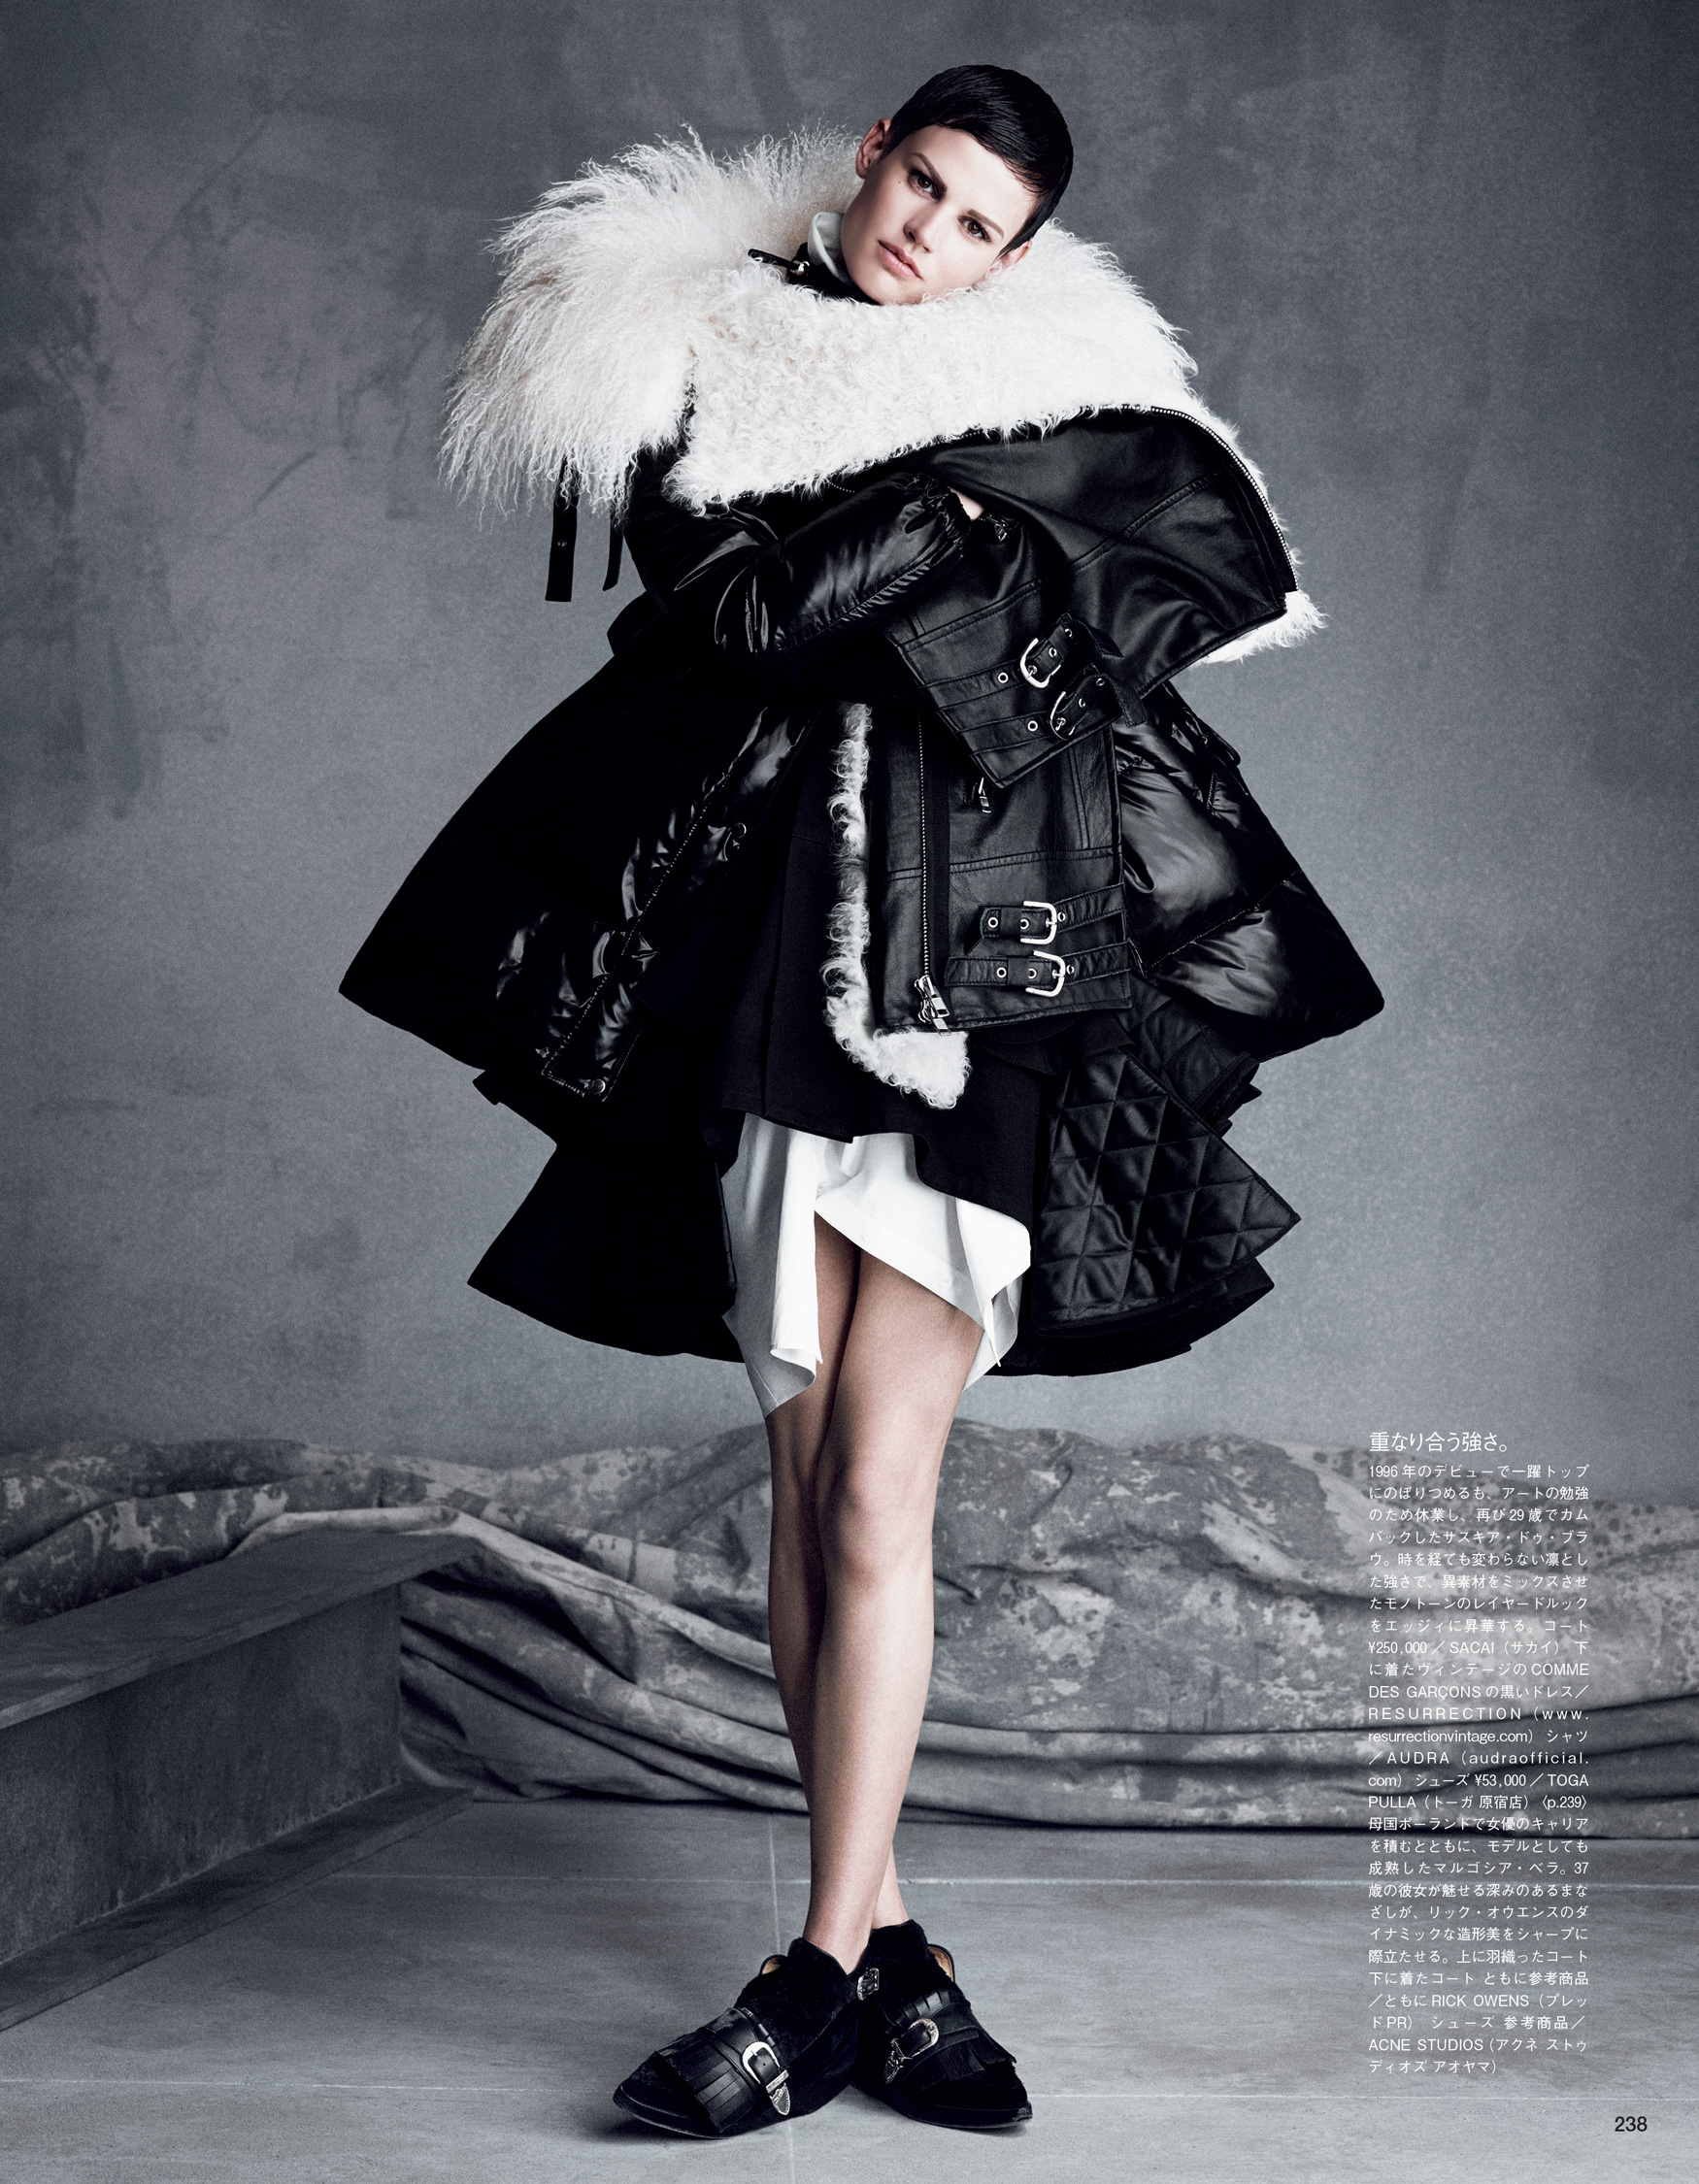 Giovanna-Battaglia-The-Icons-Of-Perfections-Vogue-Japan-15th-Anniversary-Issue-Luigi-Iango-V181_238_200-27-1.jpg